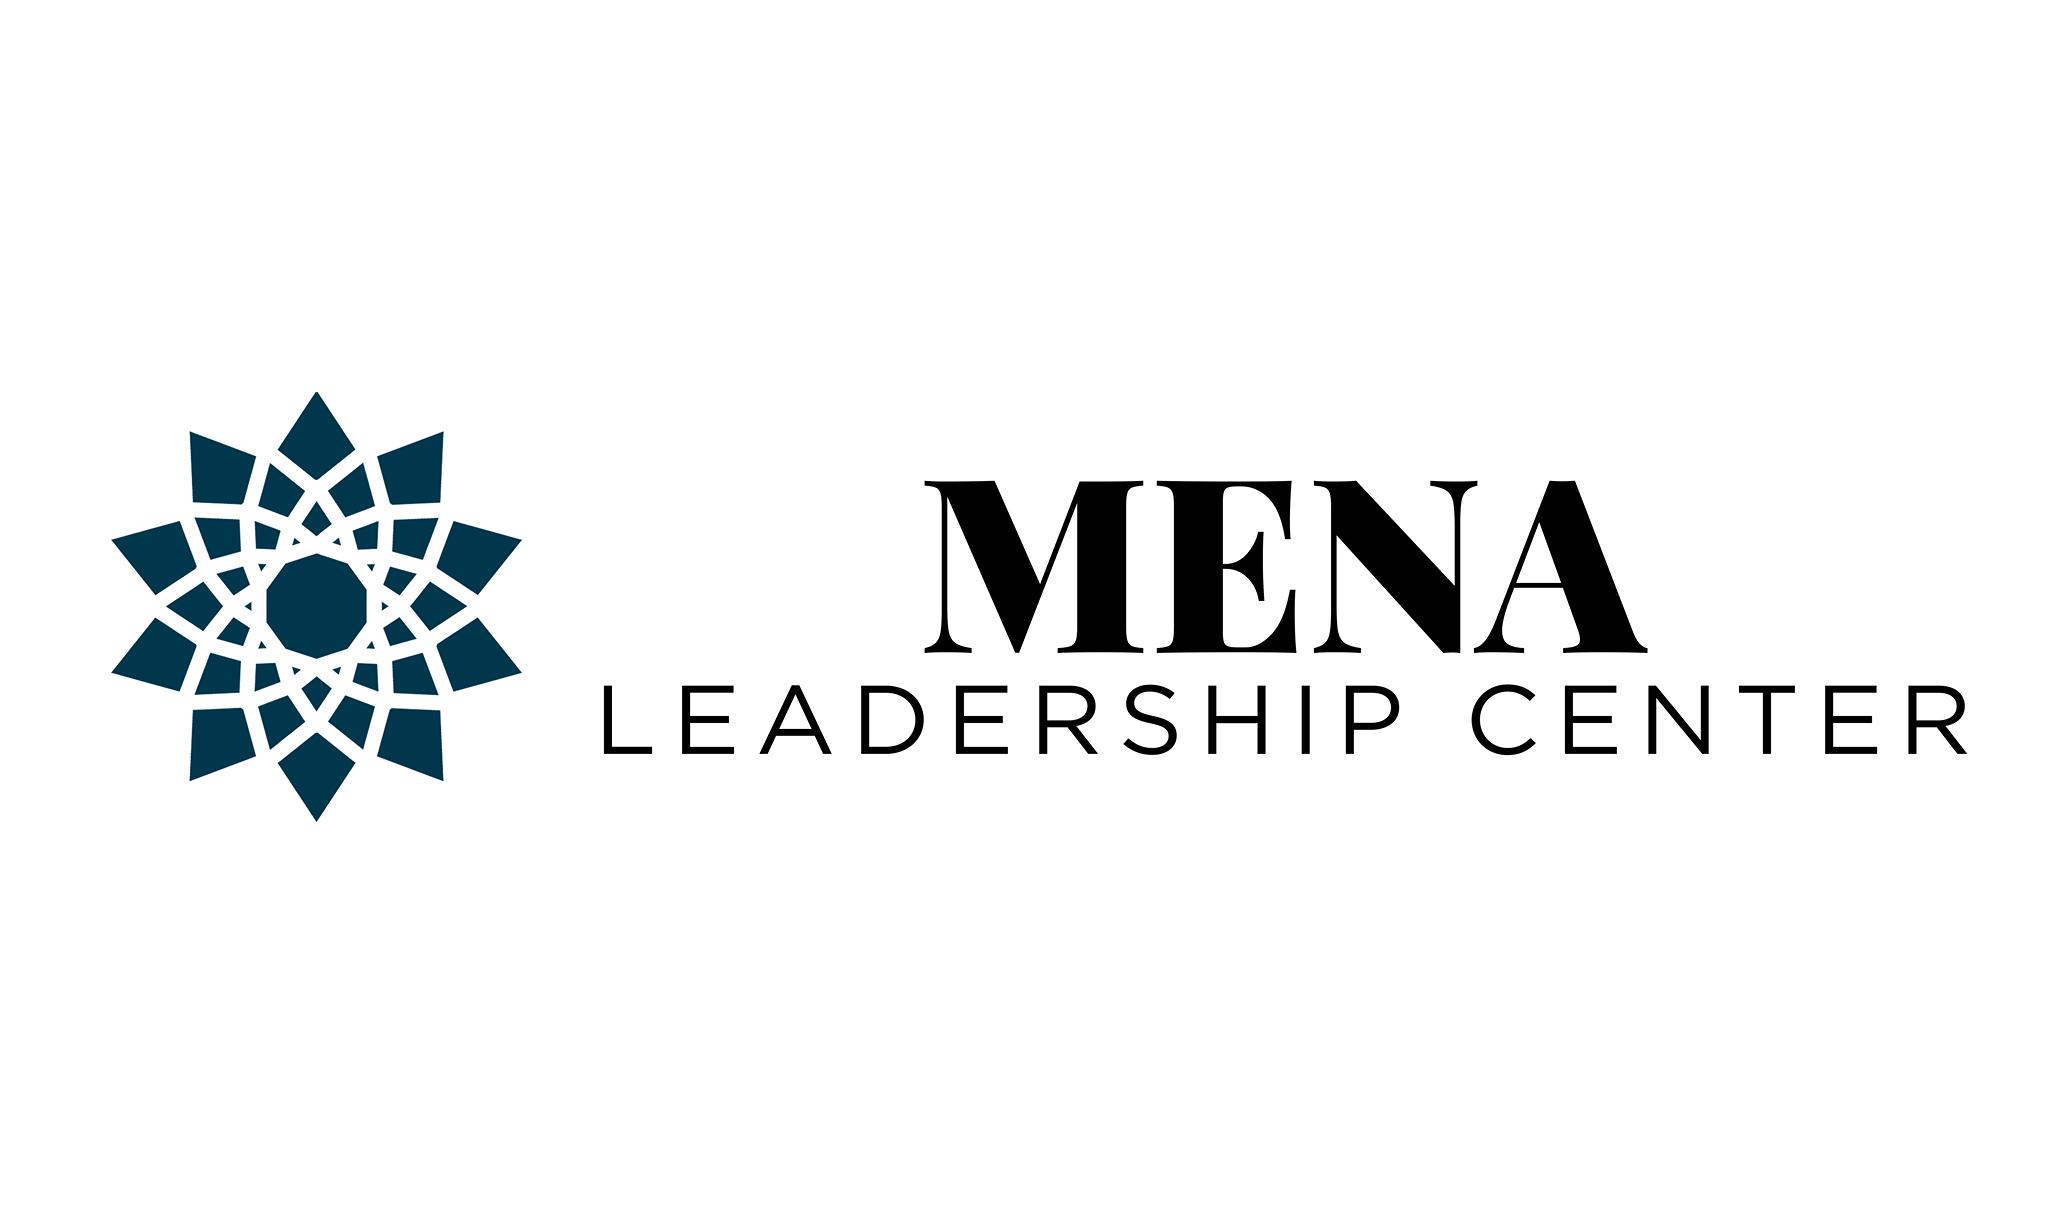 MENA Leadership Center equips believers in critical territory